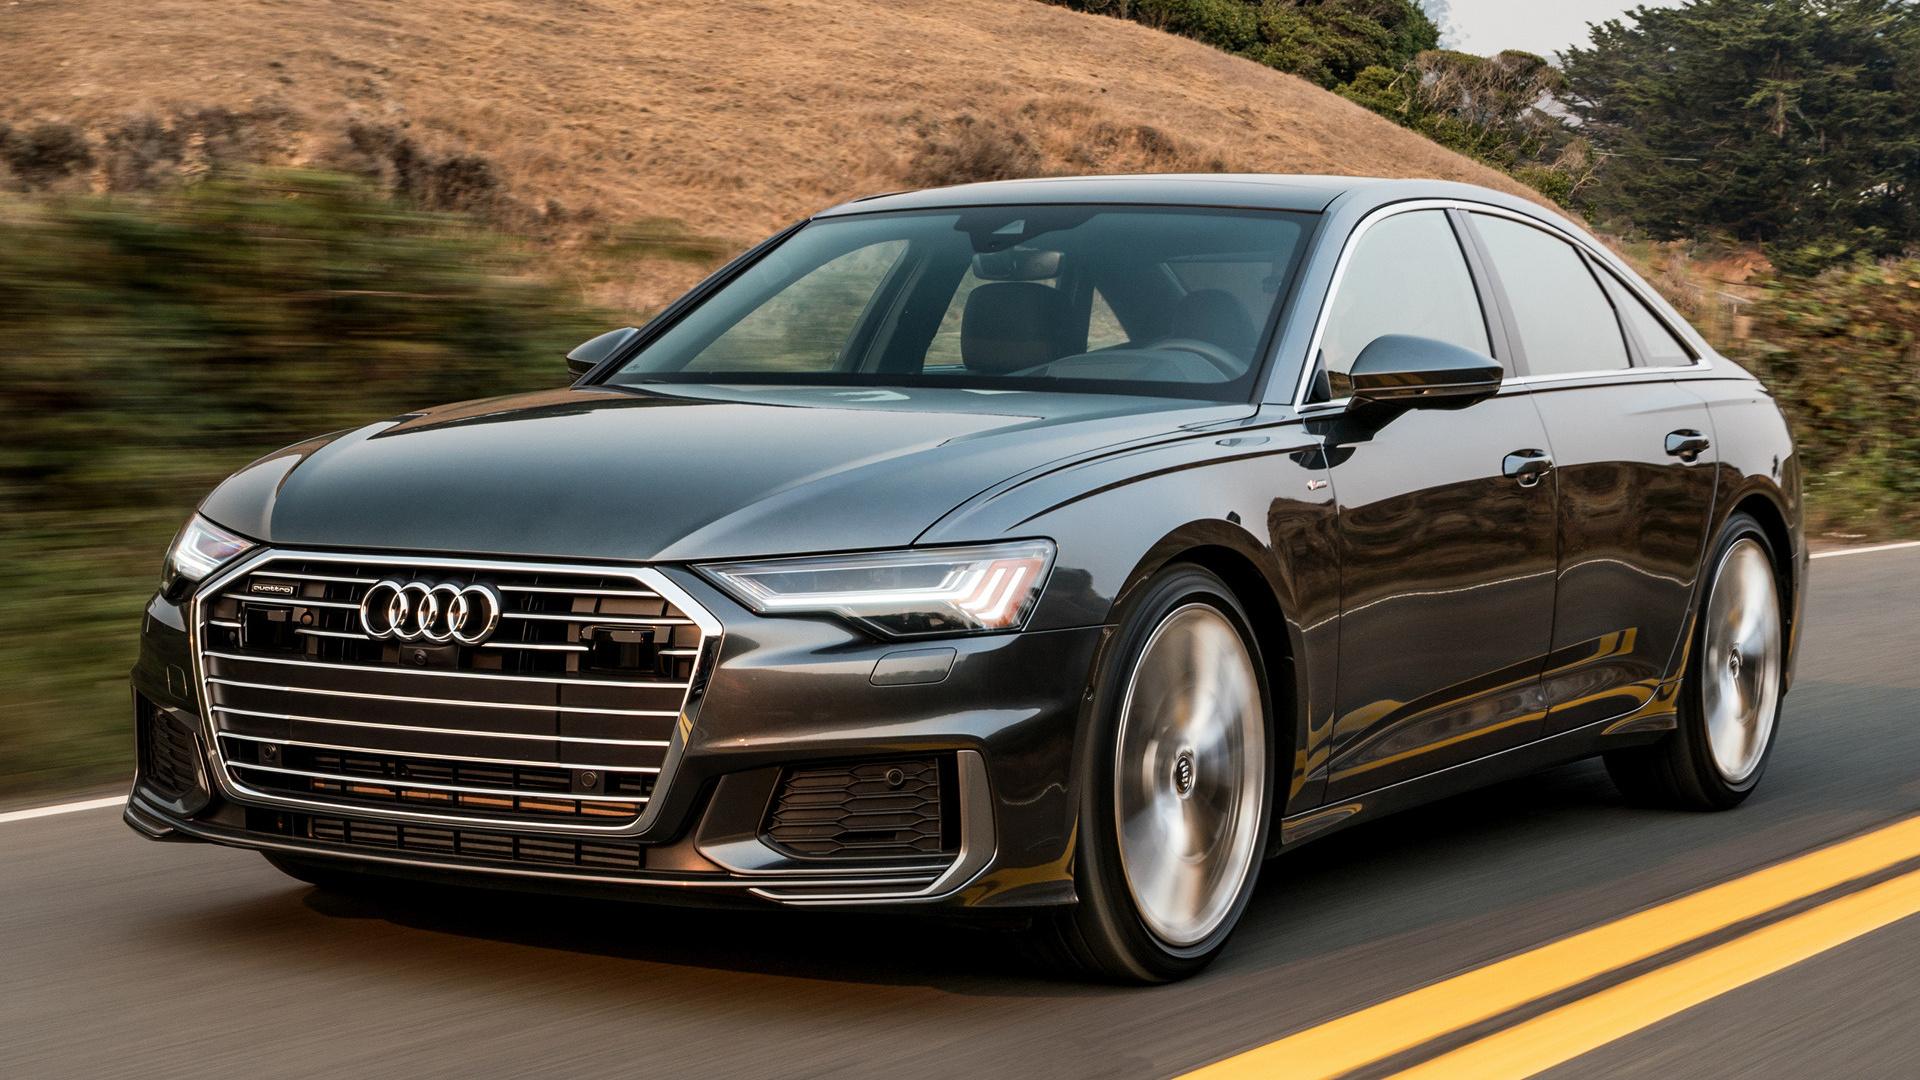 2019 Audi A6 Sedan S line (US) - Hintergrundbilder und ...